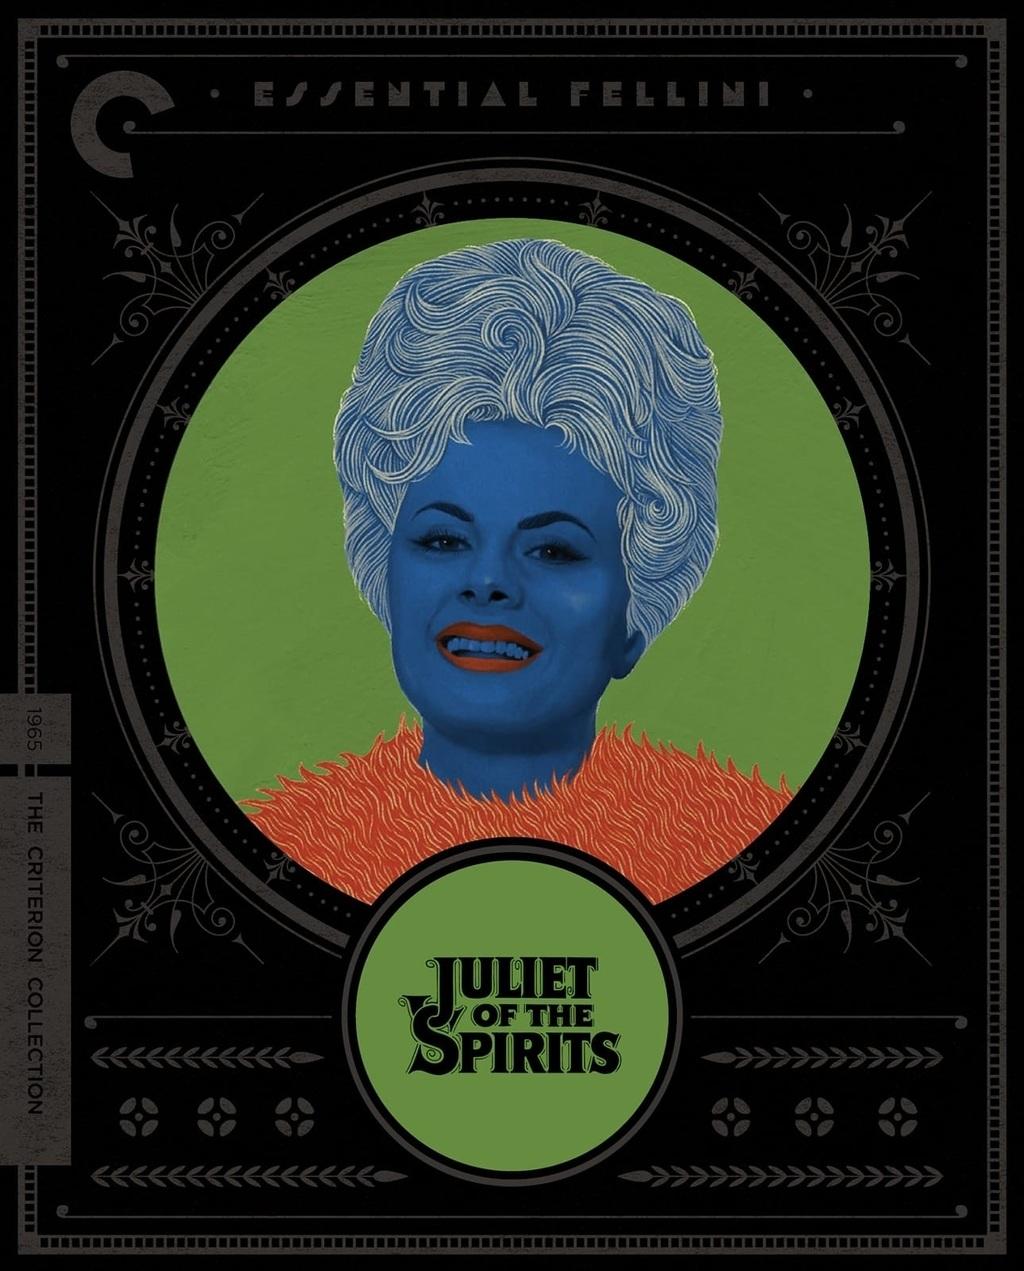 Juliet of the Spirits / Giulietta degli spiriti (1965) [Criterion Collection]